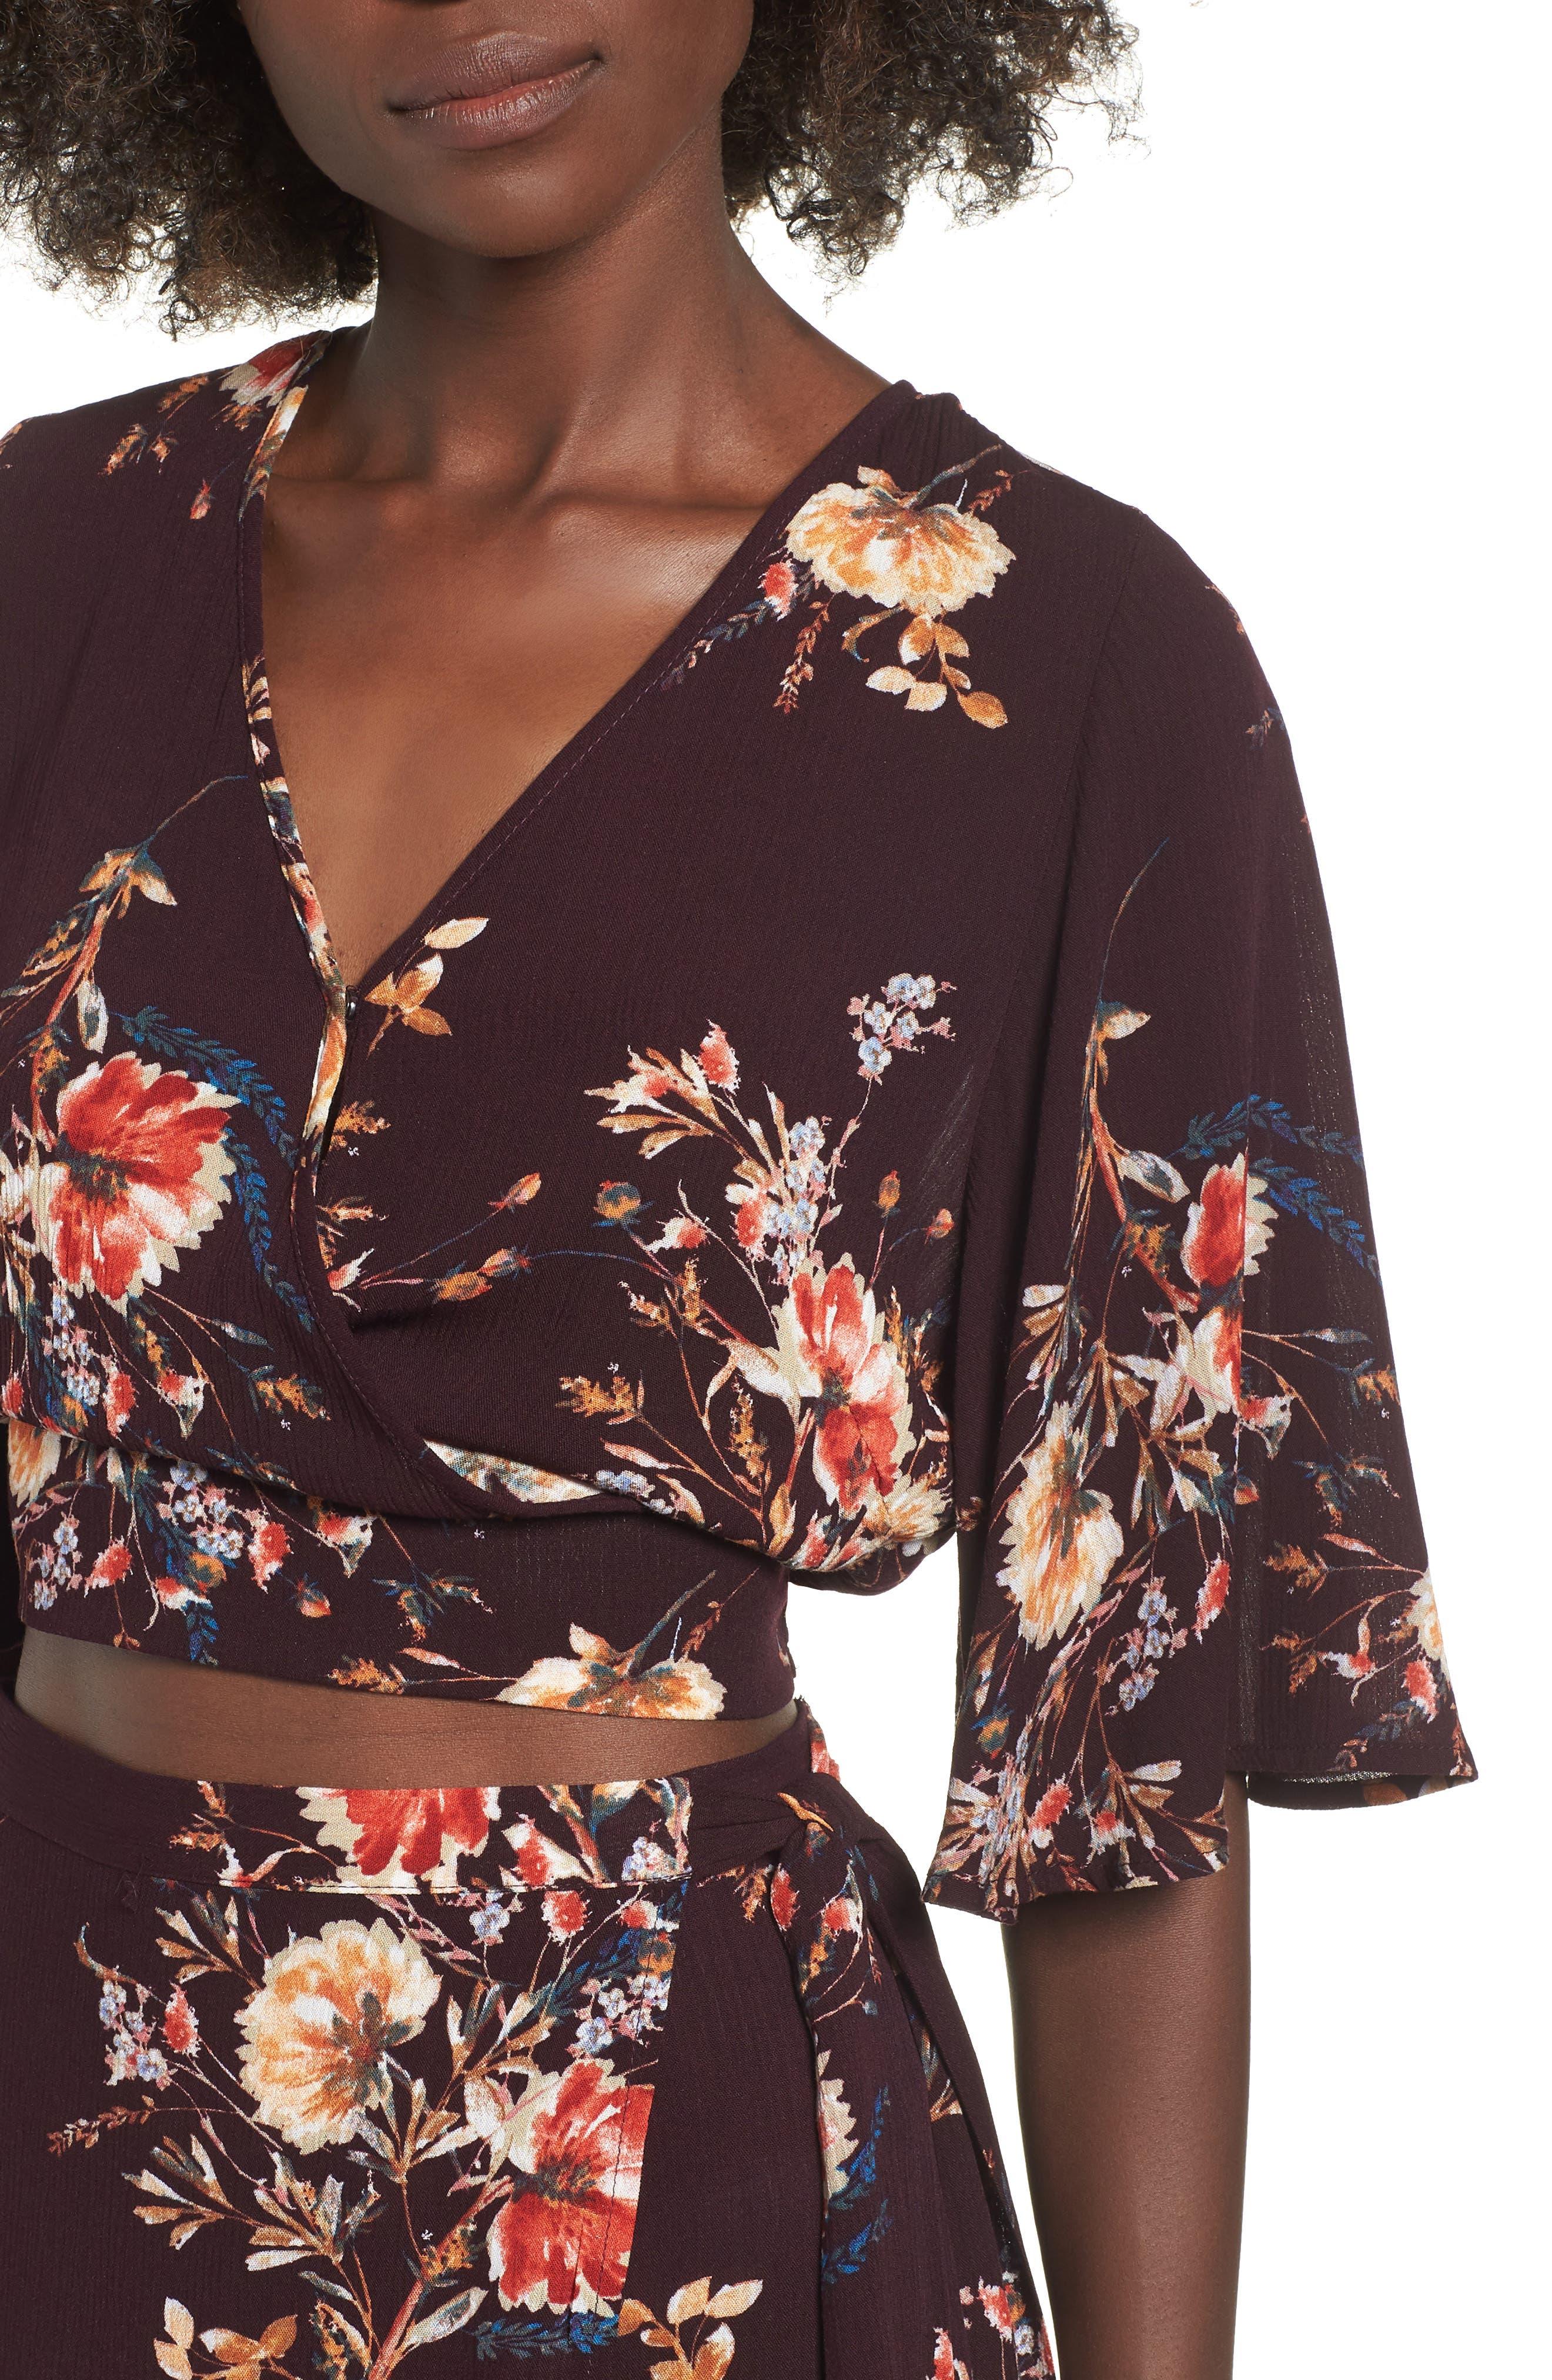 Shadow Floral Tie Back Crop Top,                             Alternate thumbnail 4, color,                             BURGUNDY/ PEACH